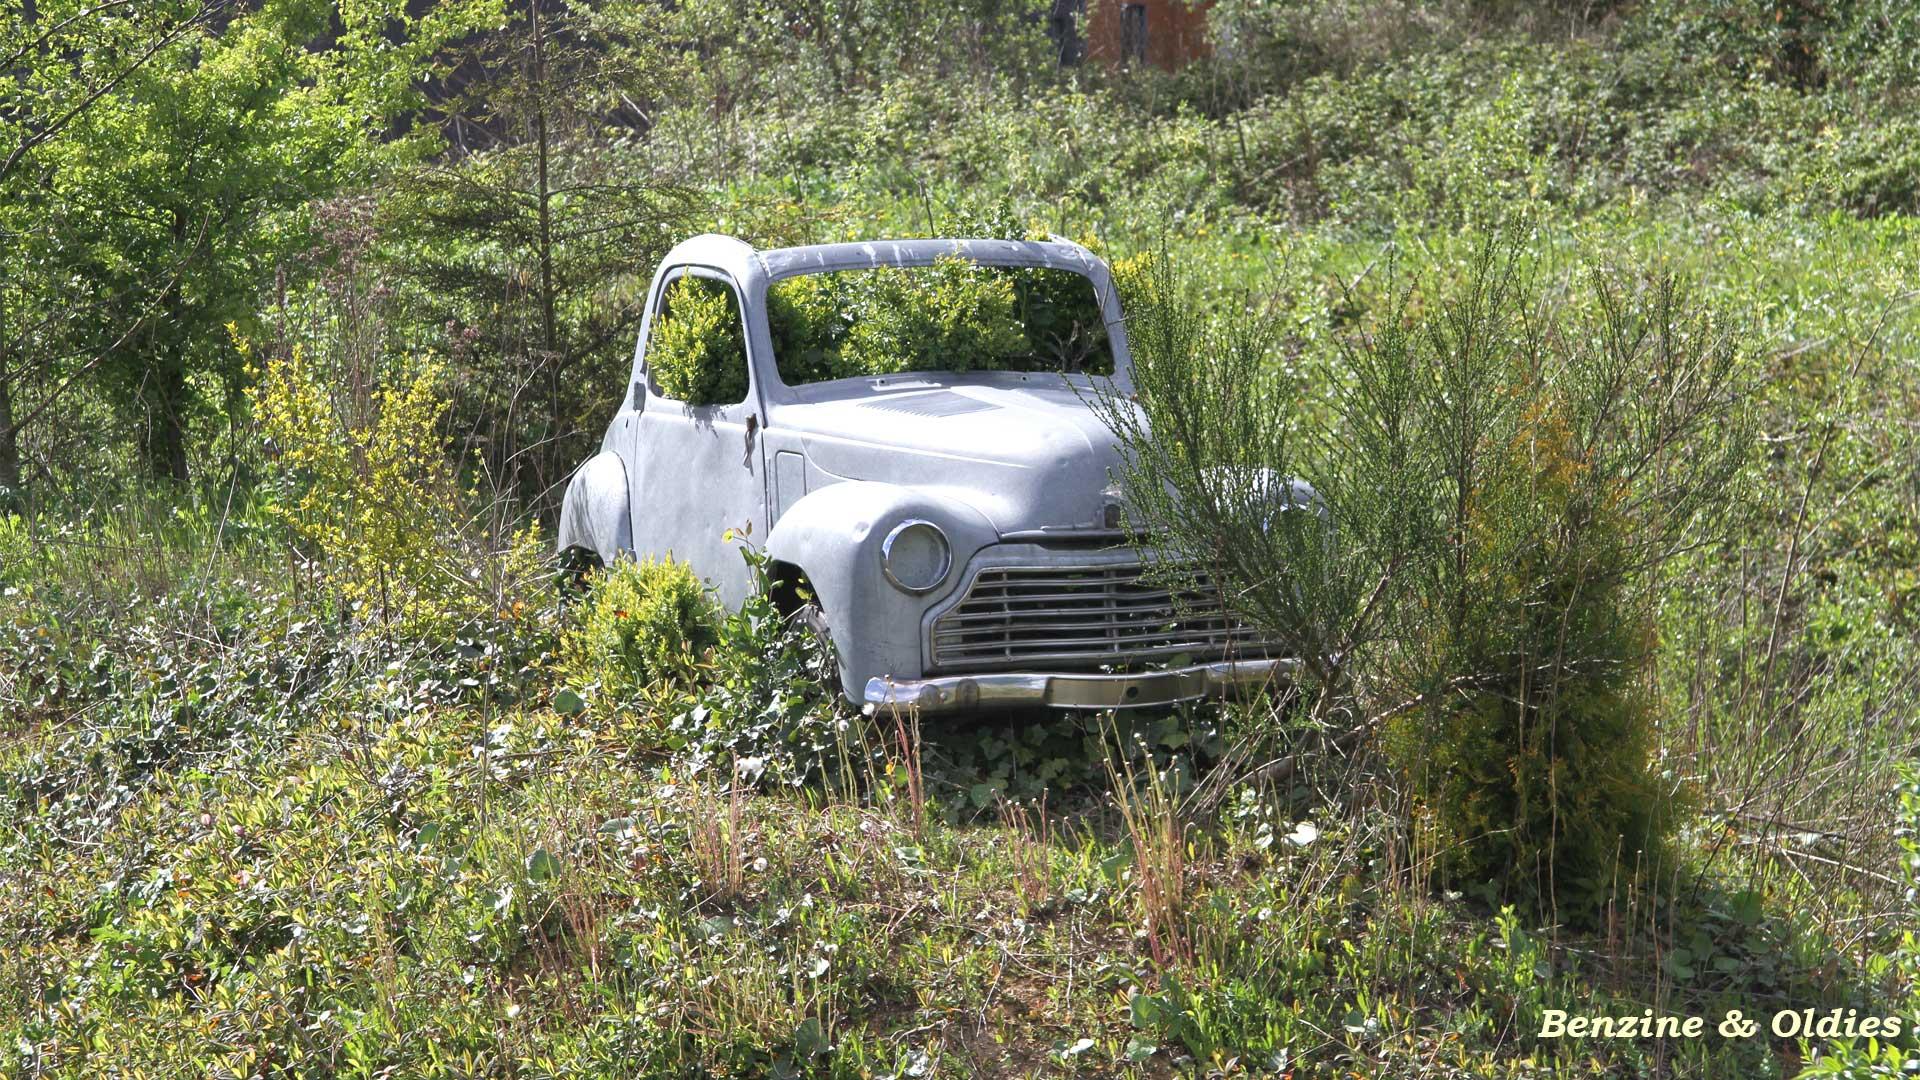 une Simca 6 carrosserie aluminium oubliée dans la nature - Simca6 913582simca6street08w19201080